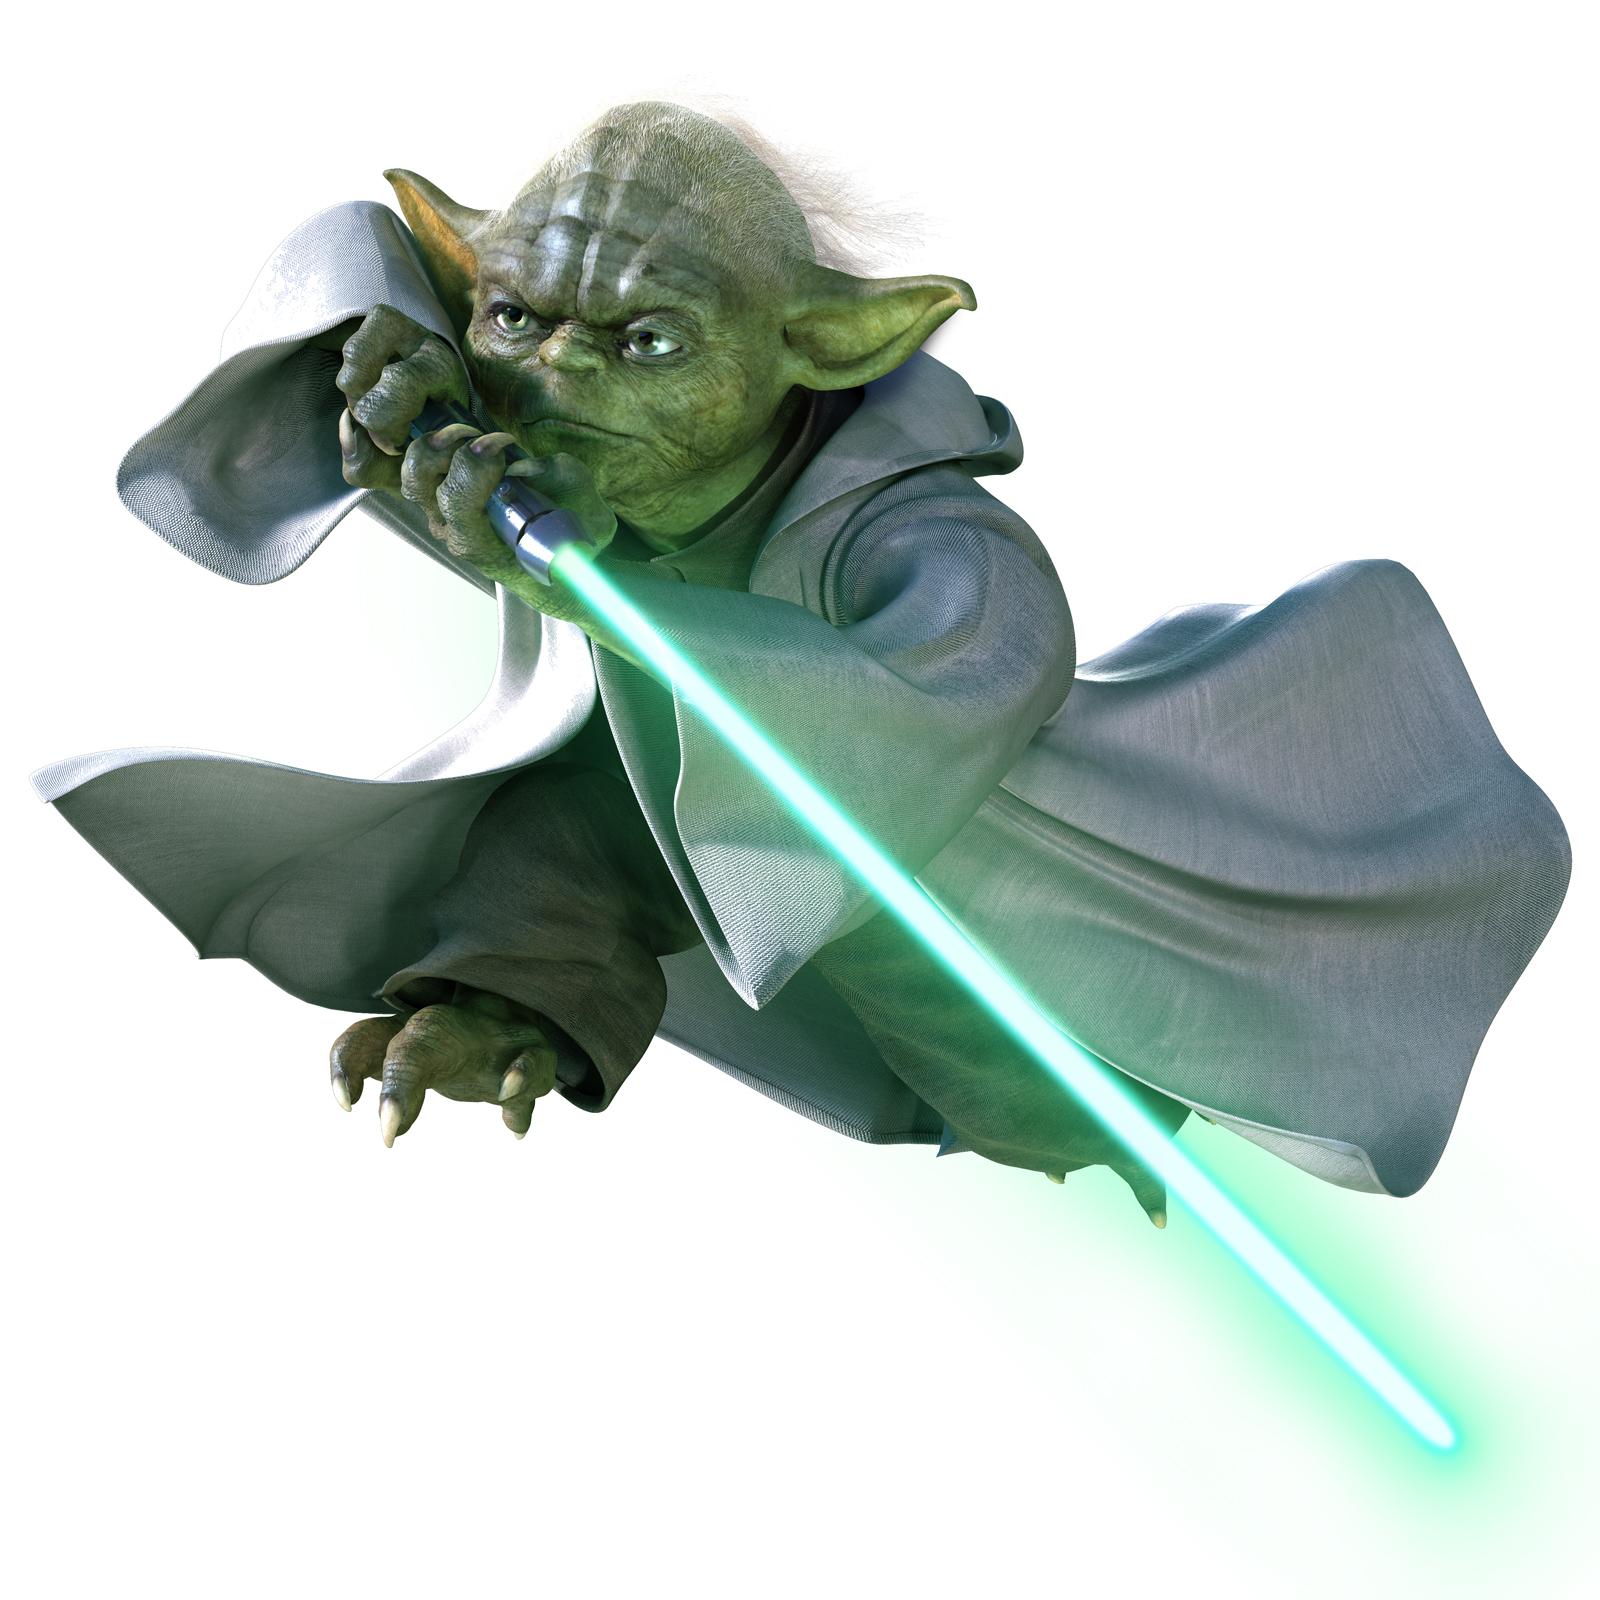 Star Wars Yoda PNG-PlusPNG.com-1600 - Star Wars Yoda PNG